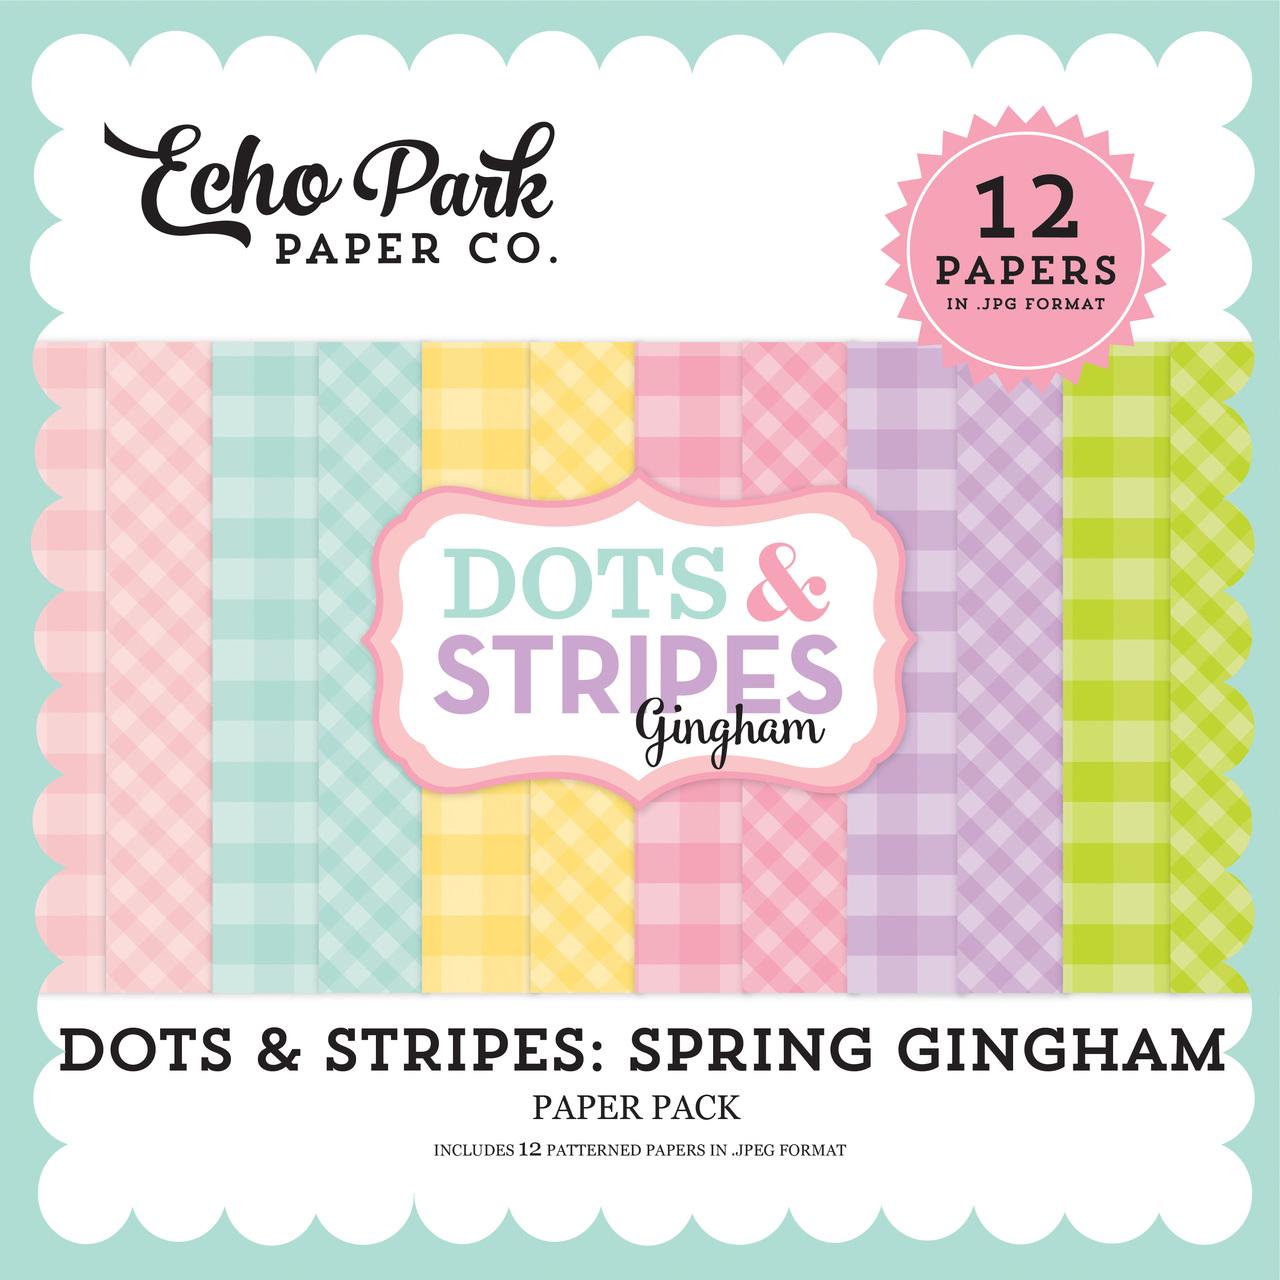 Dots & Stripes: Spring Gingham Paper Pack